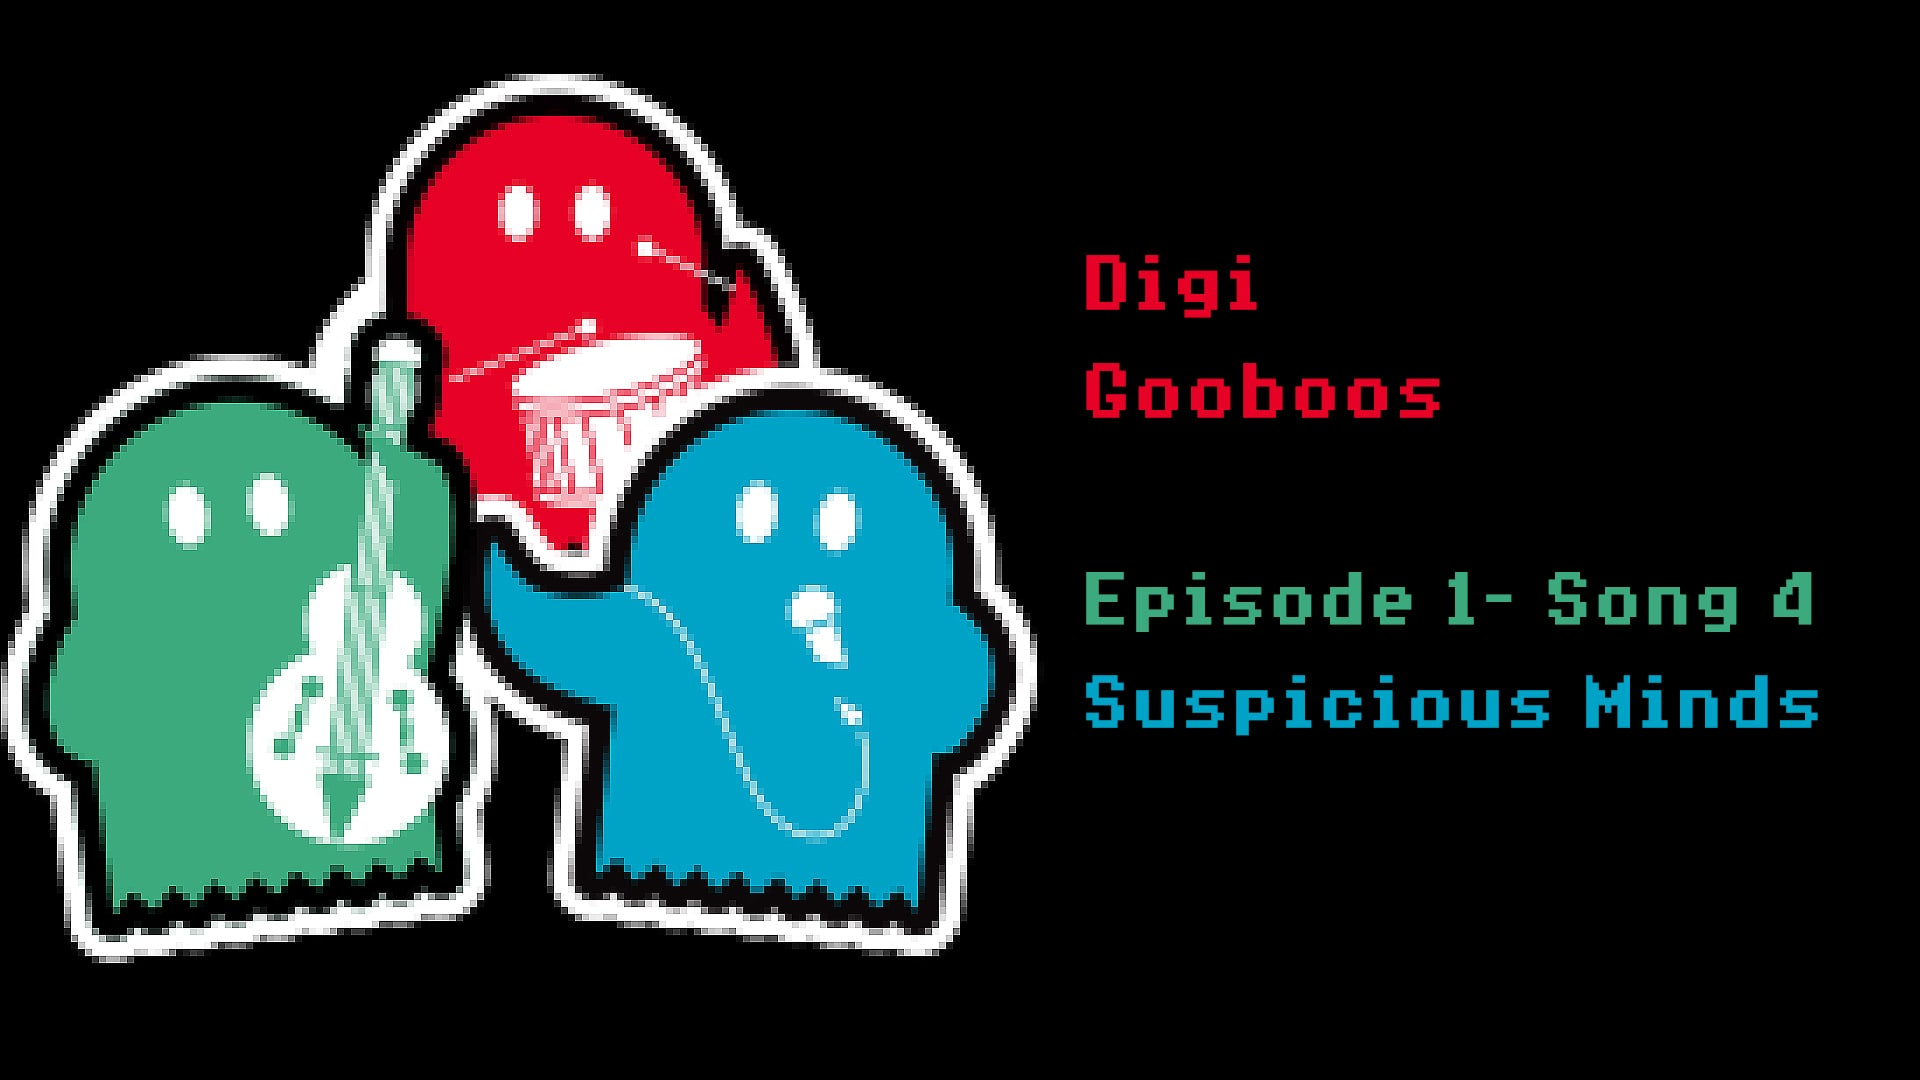 Digi GooBoos Song 4 - Suspicious Minds